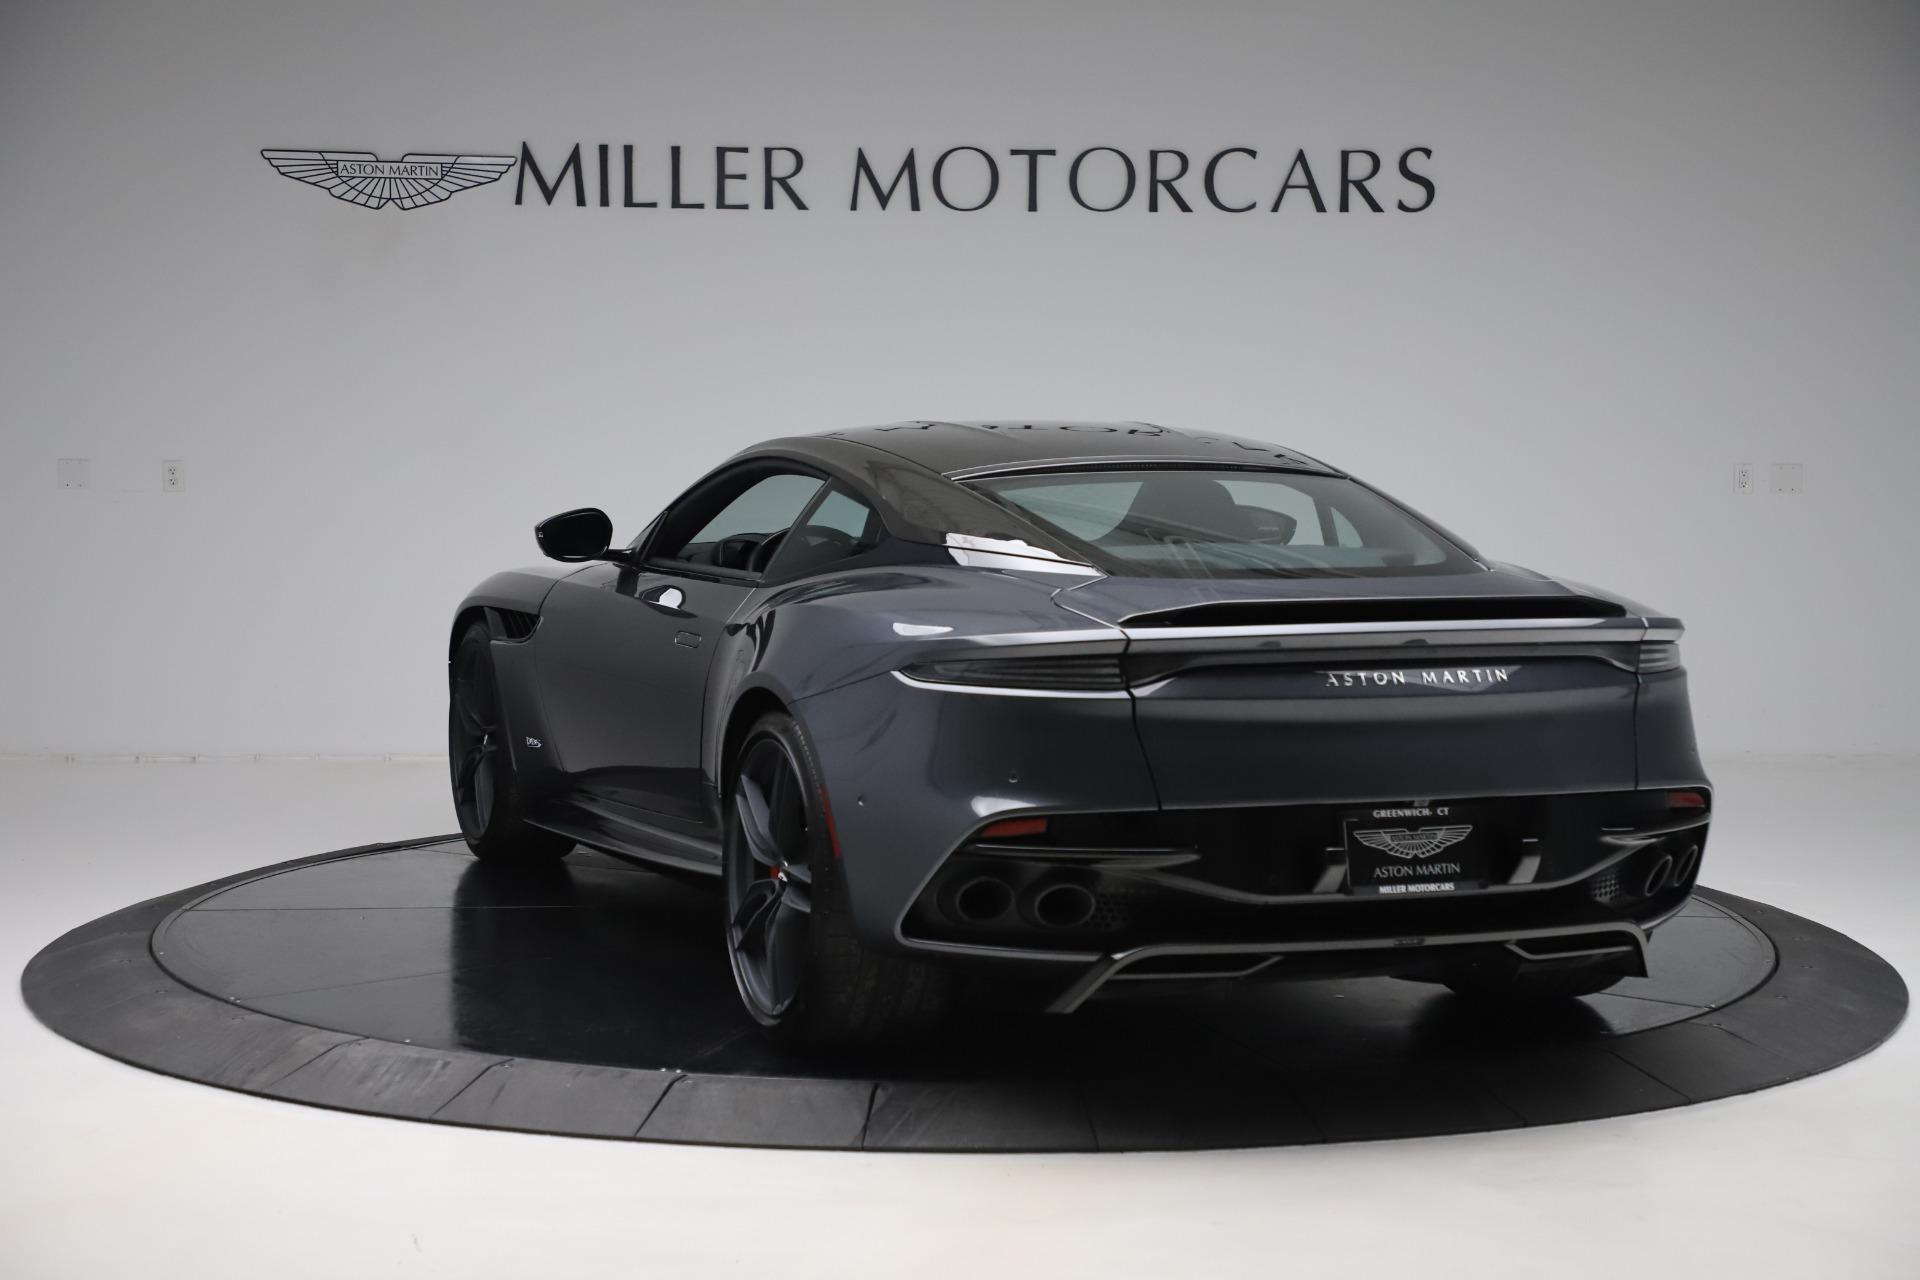 Used 2019 Aston Martin DBS Superleggera Coupe For Sale In Westport, CT 3570_p5